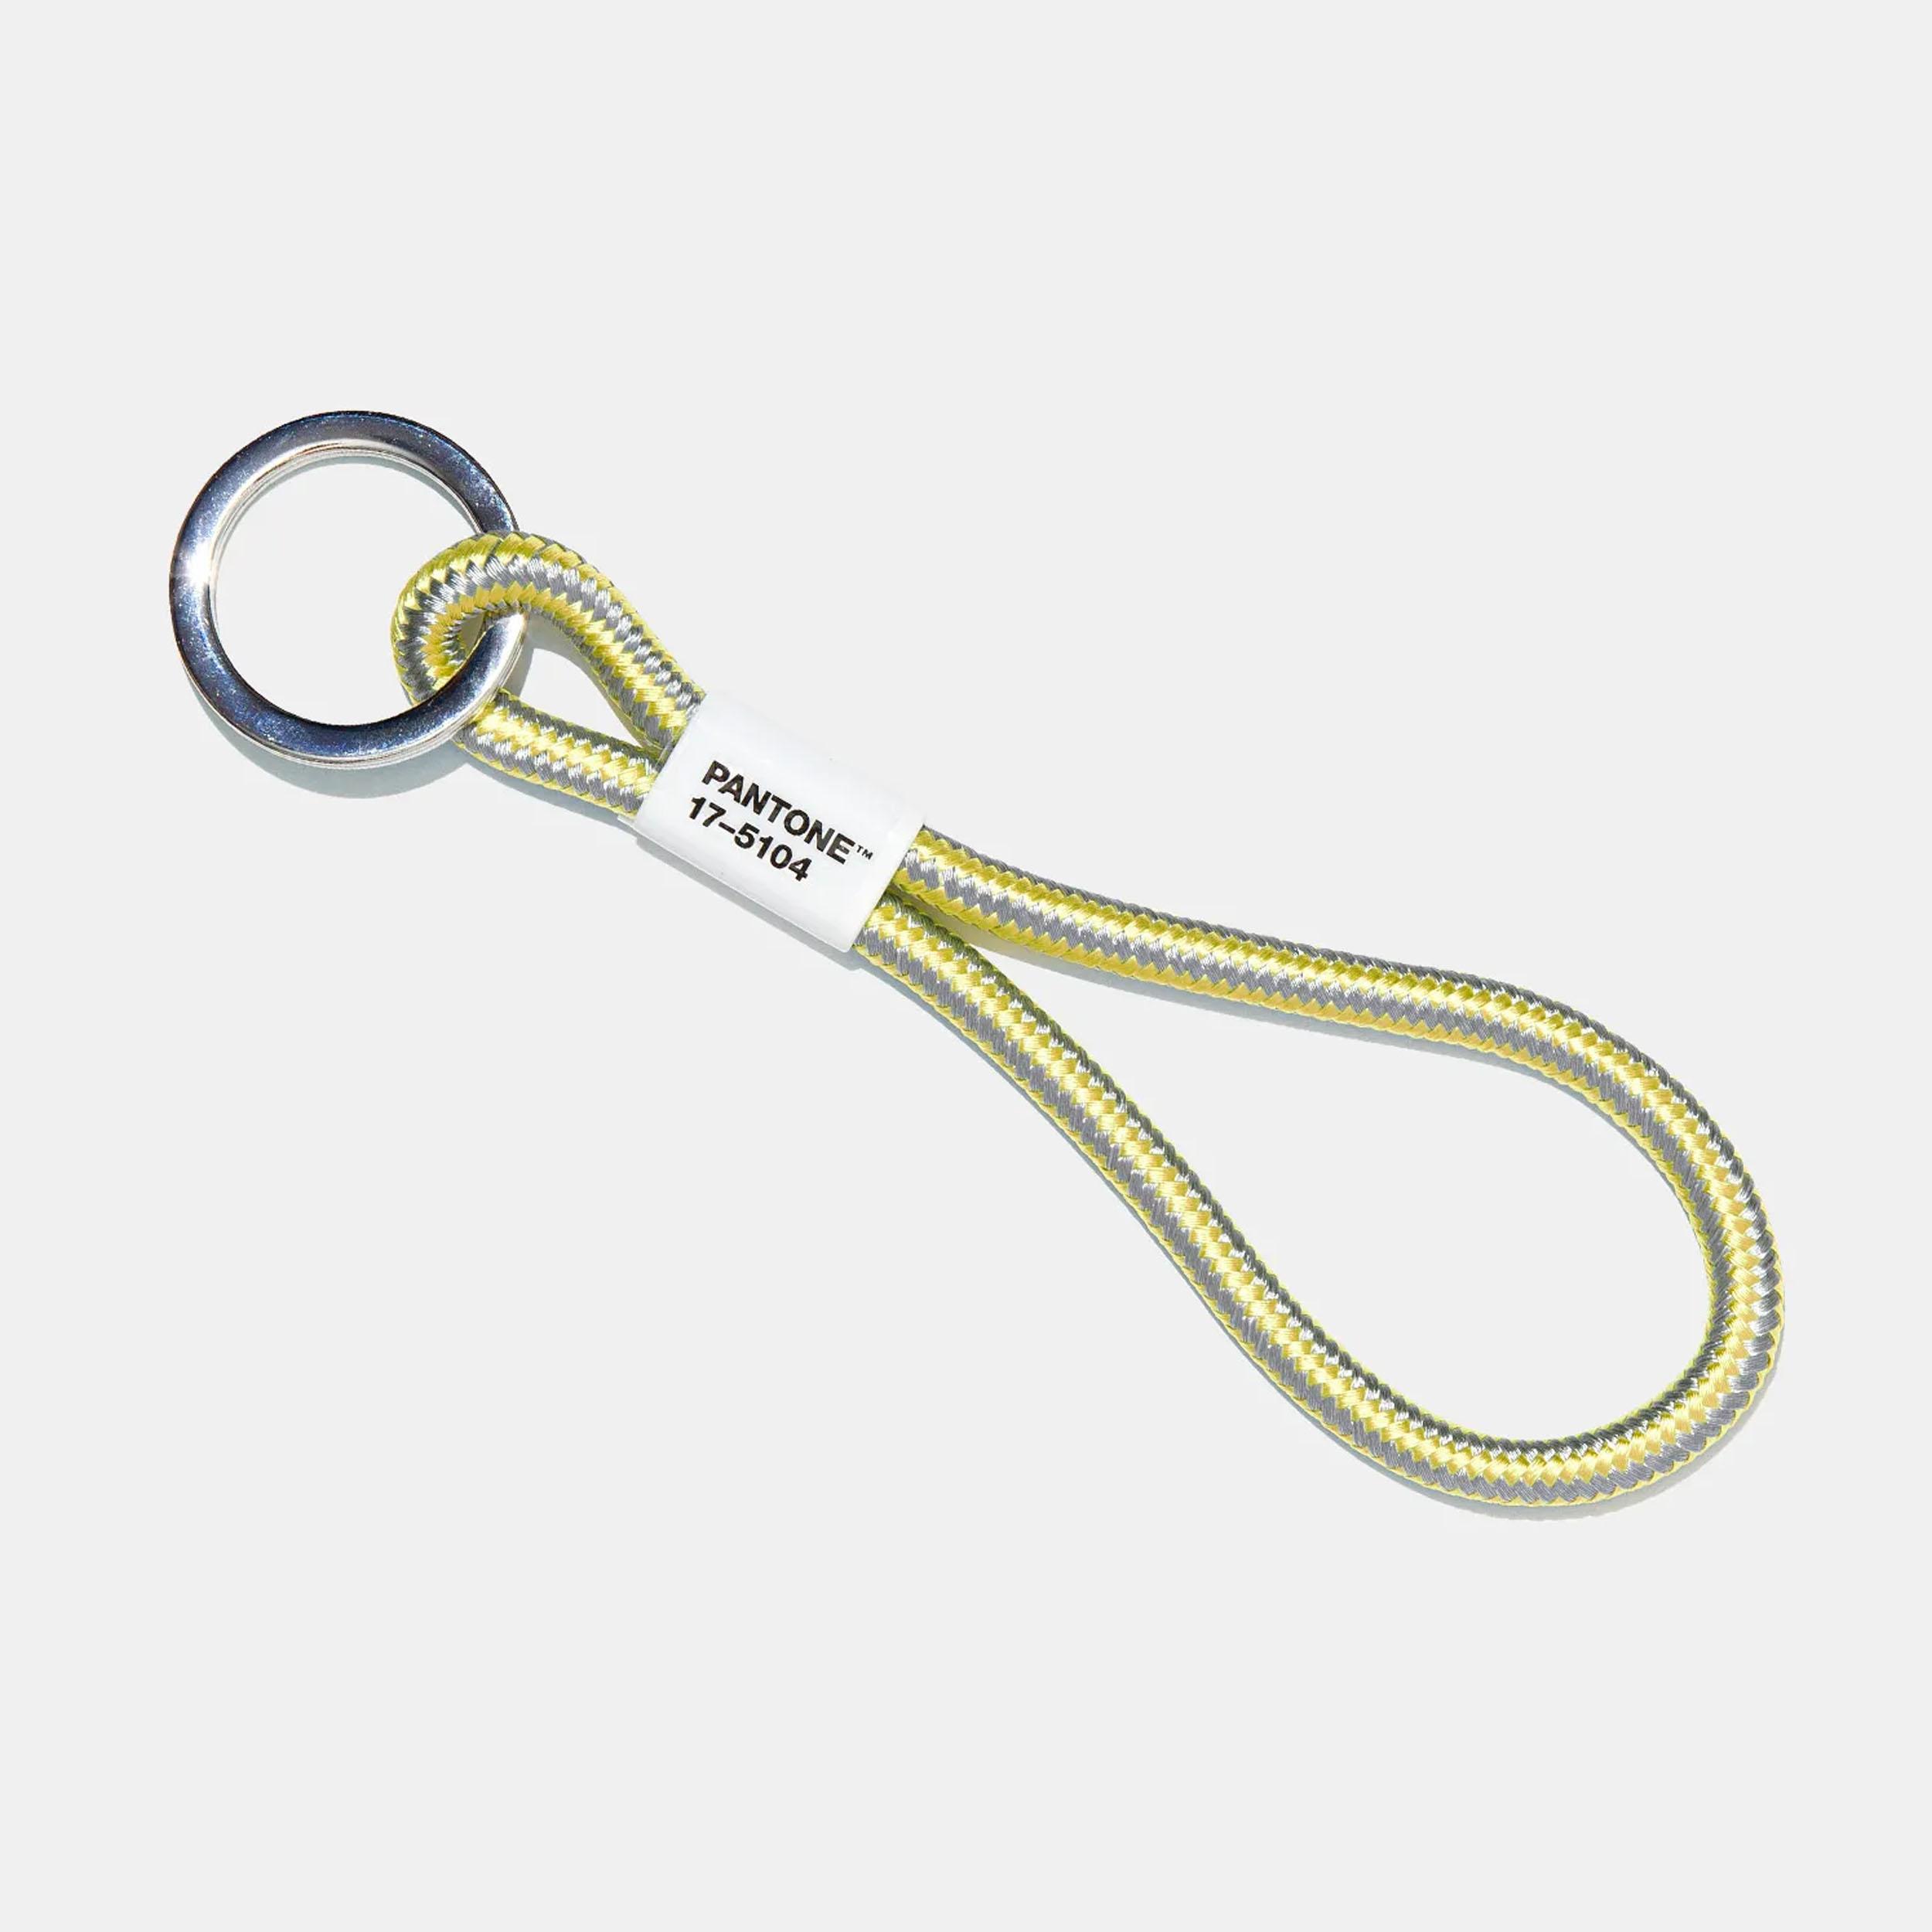 Pantone Schlüsselanhänger